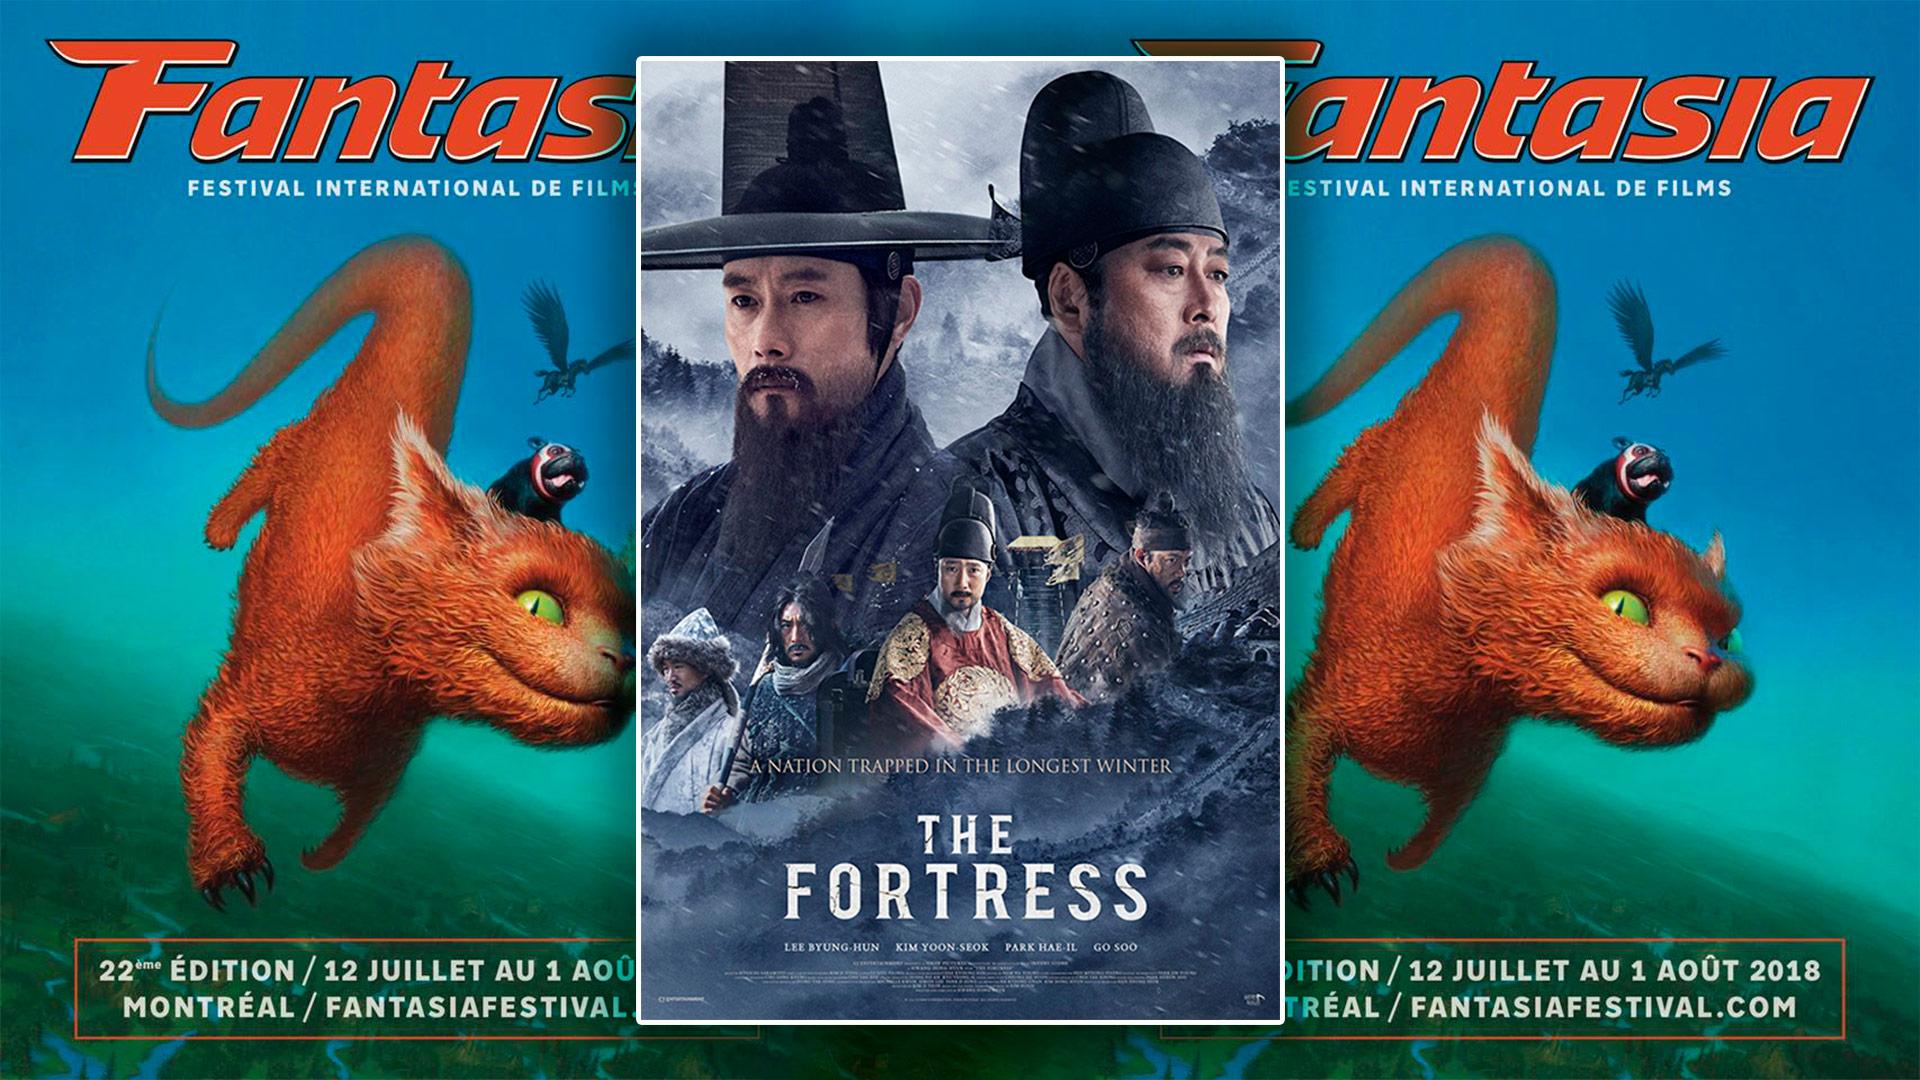 [Fantasia 2018] Critique du film The Fortress